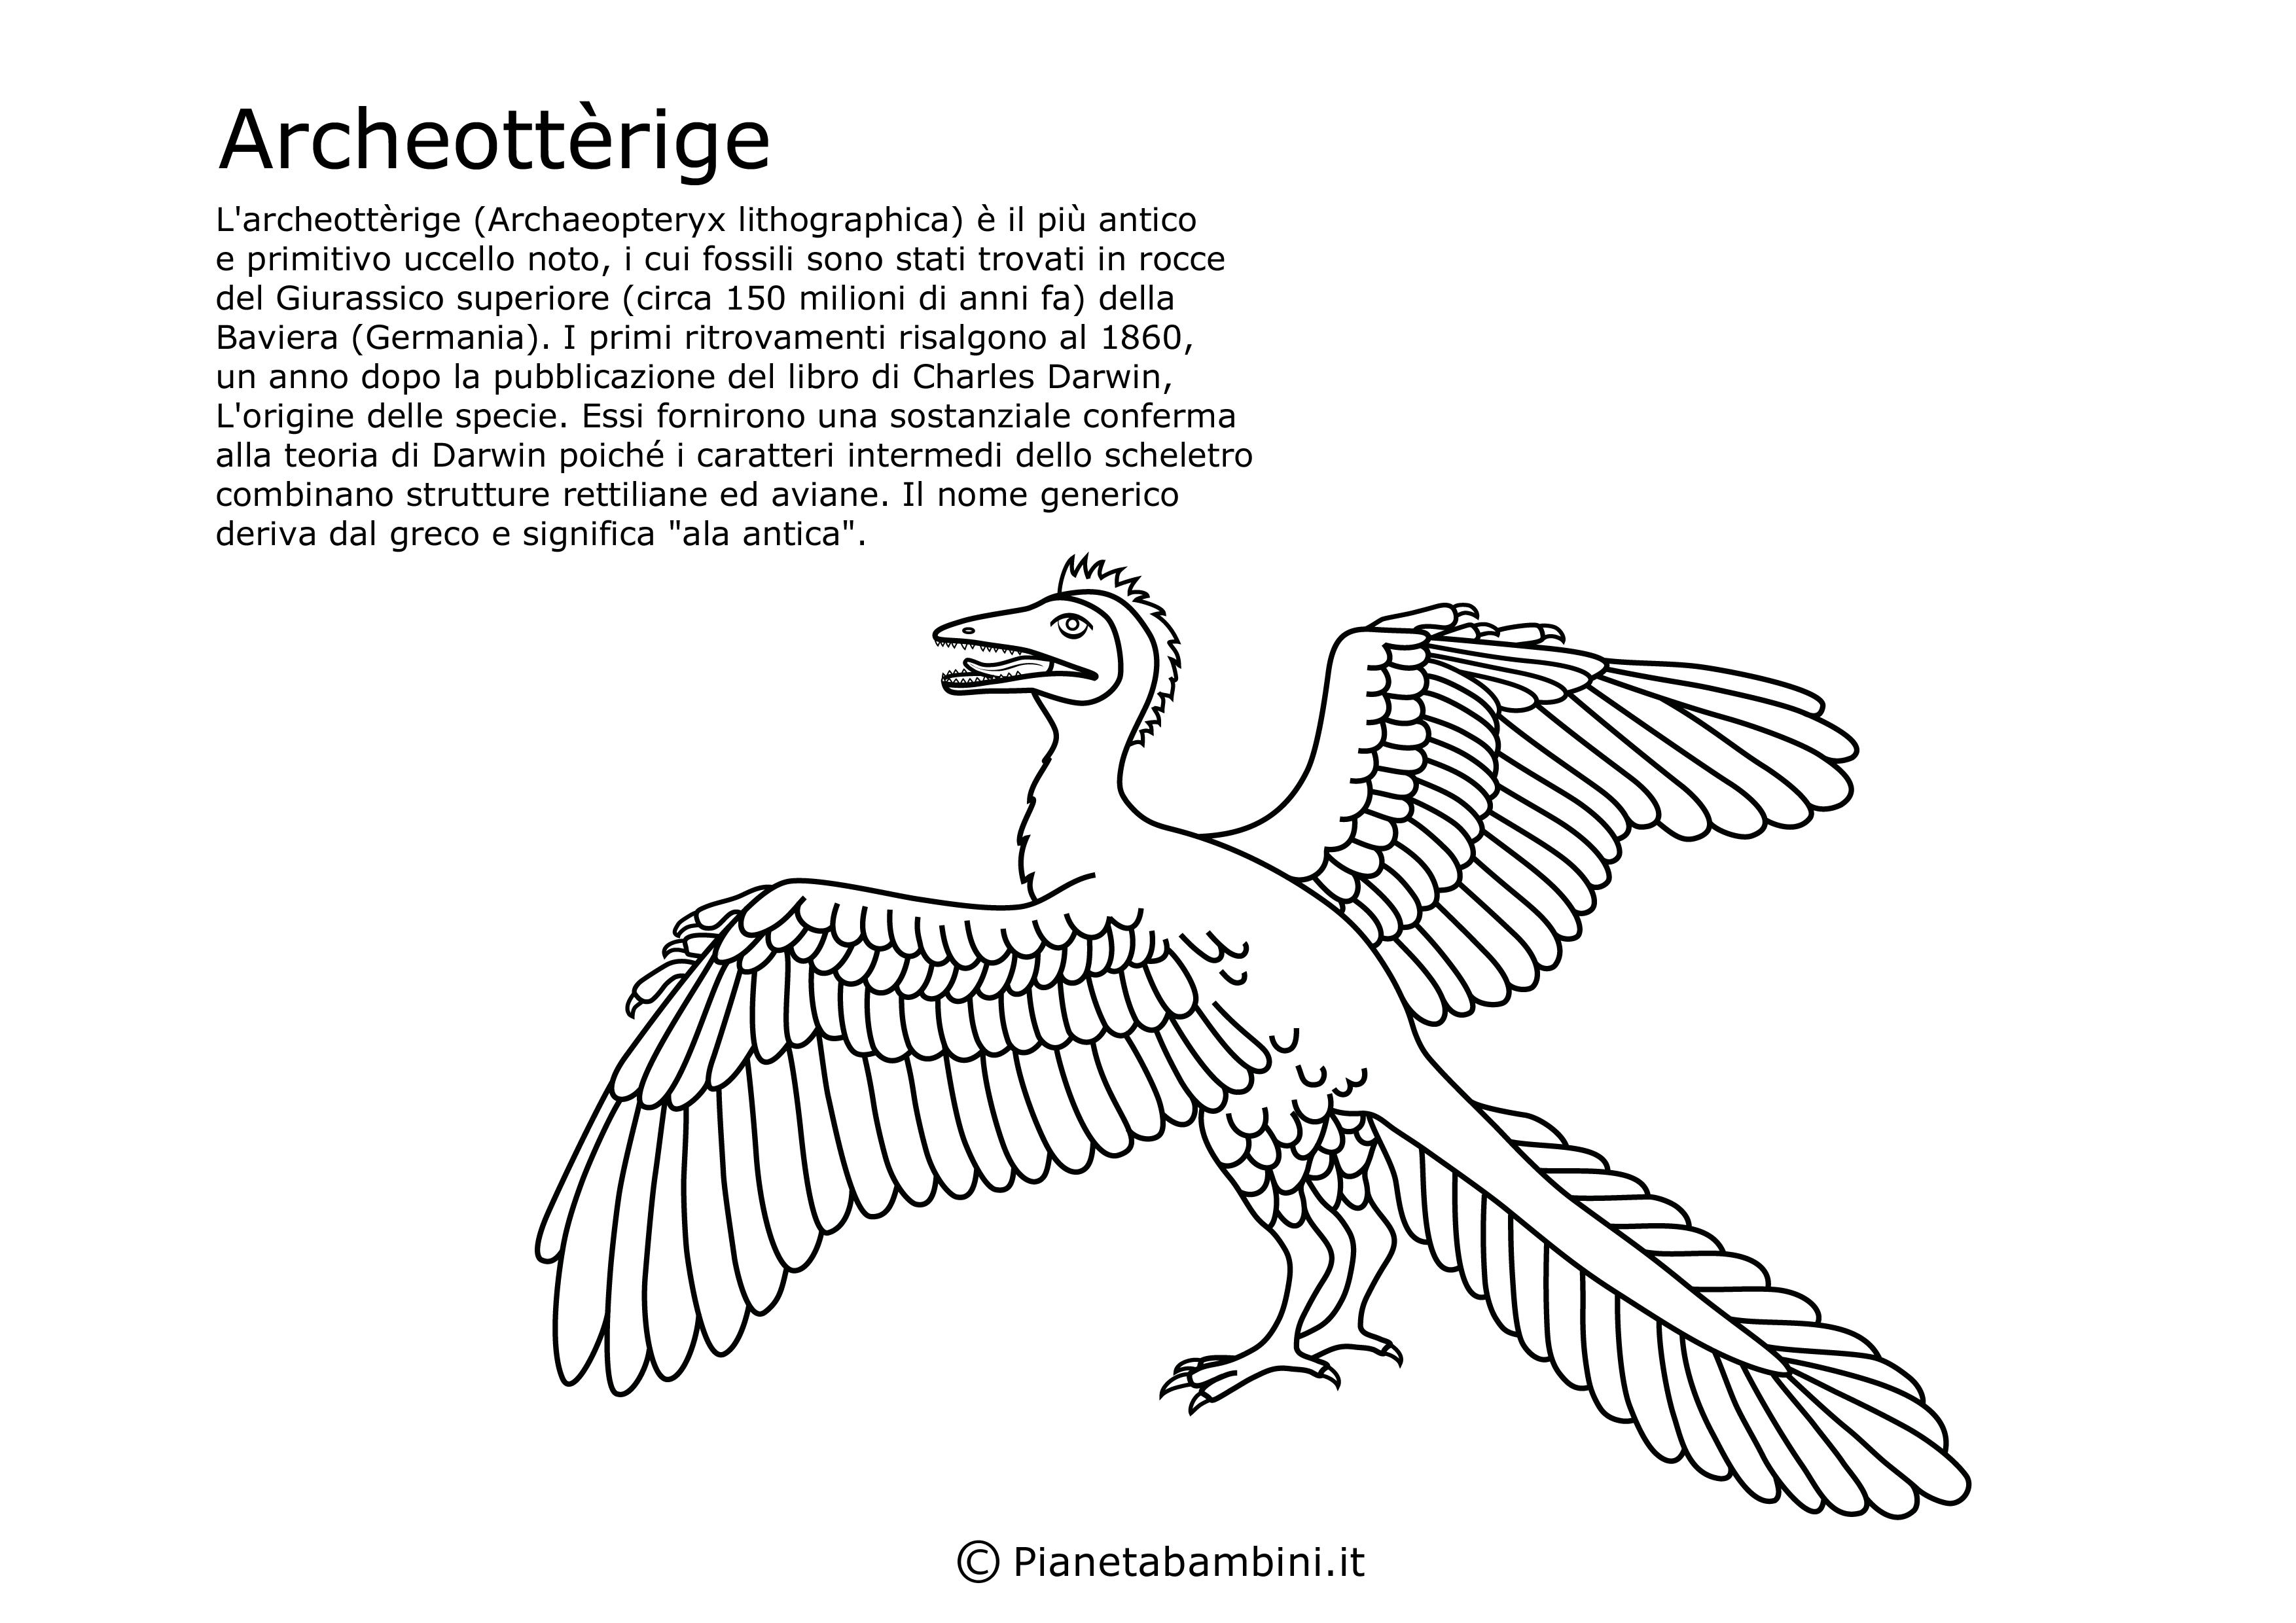 Archeottèrige